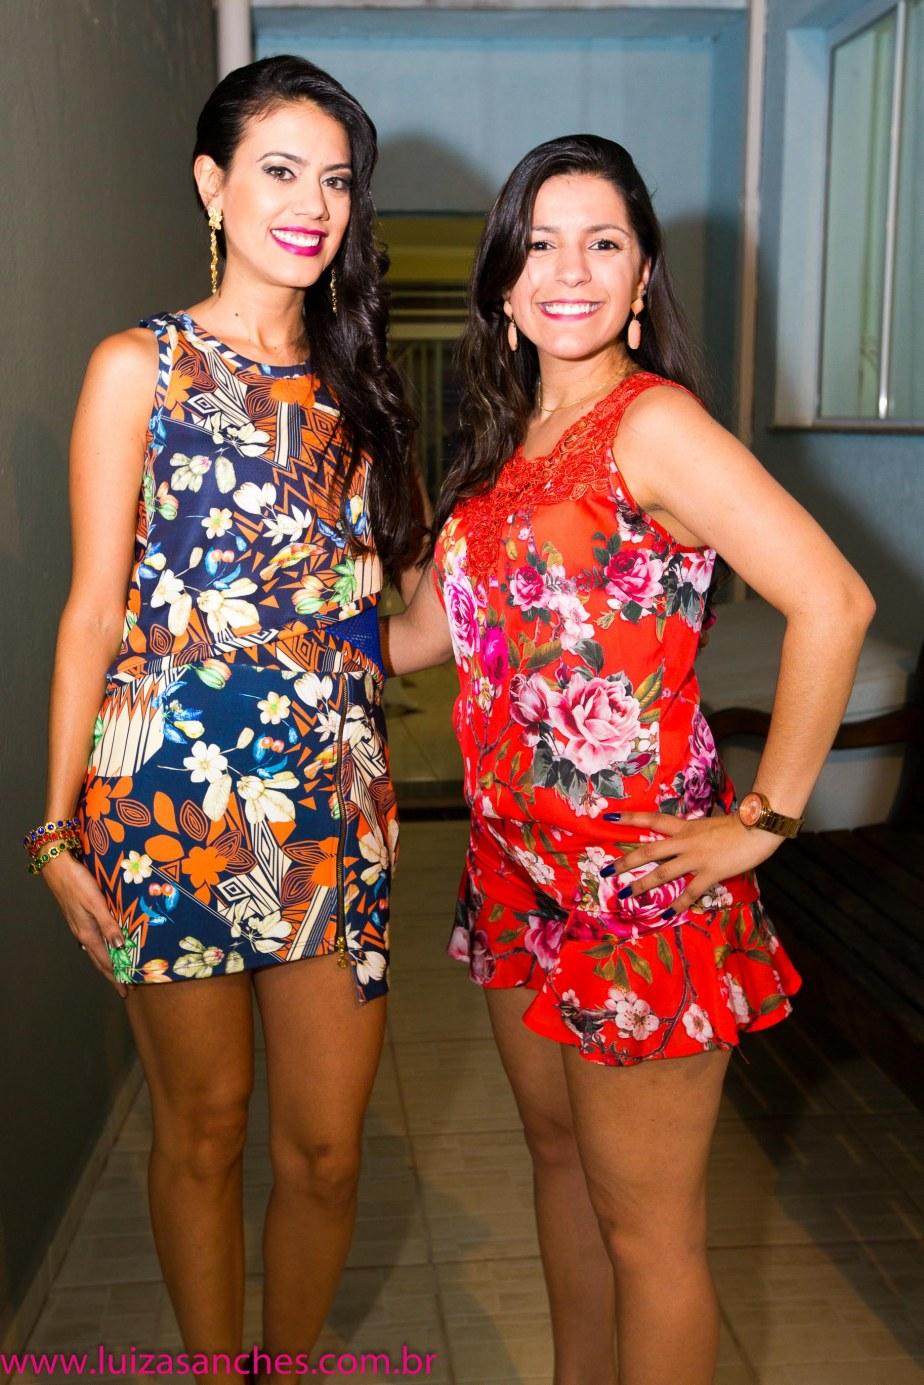 Blog da Luiza Sanches 1-13